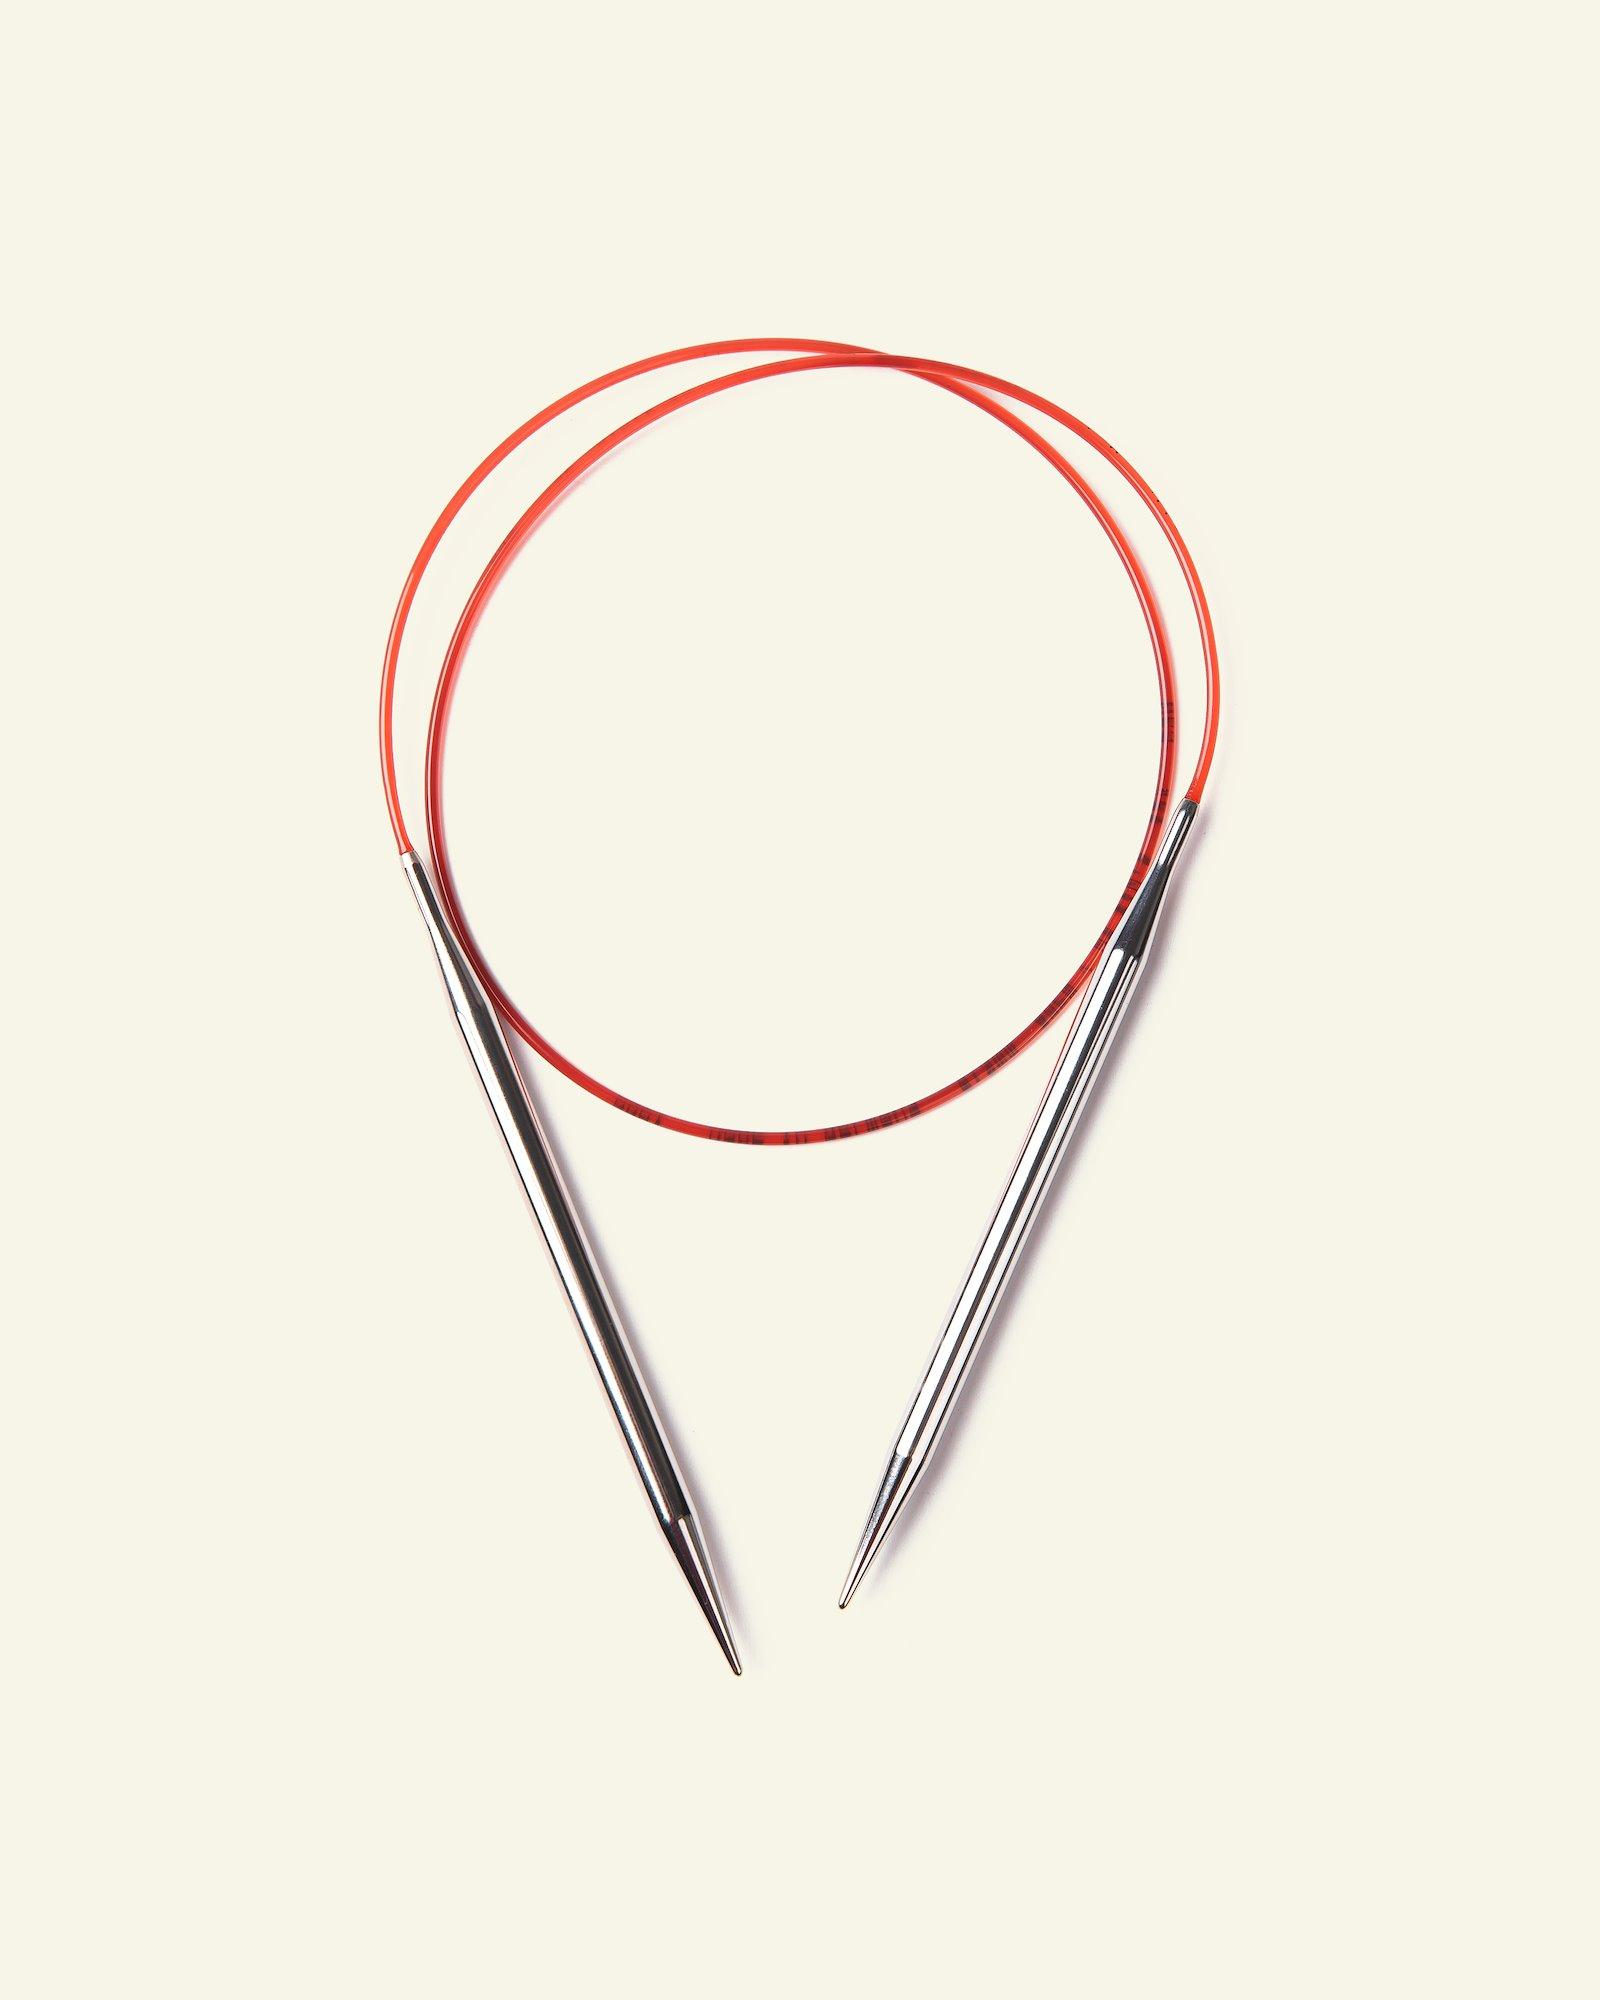 Addi Lace circular needle 80cm 6,5mm